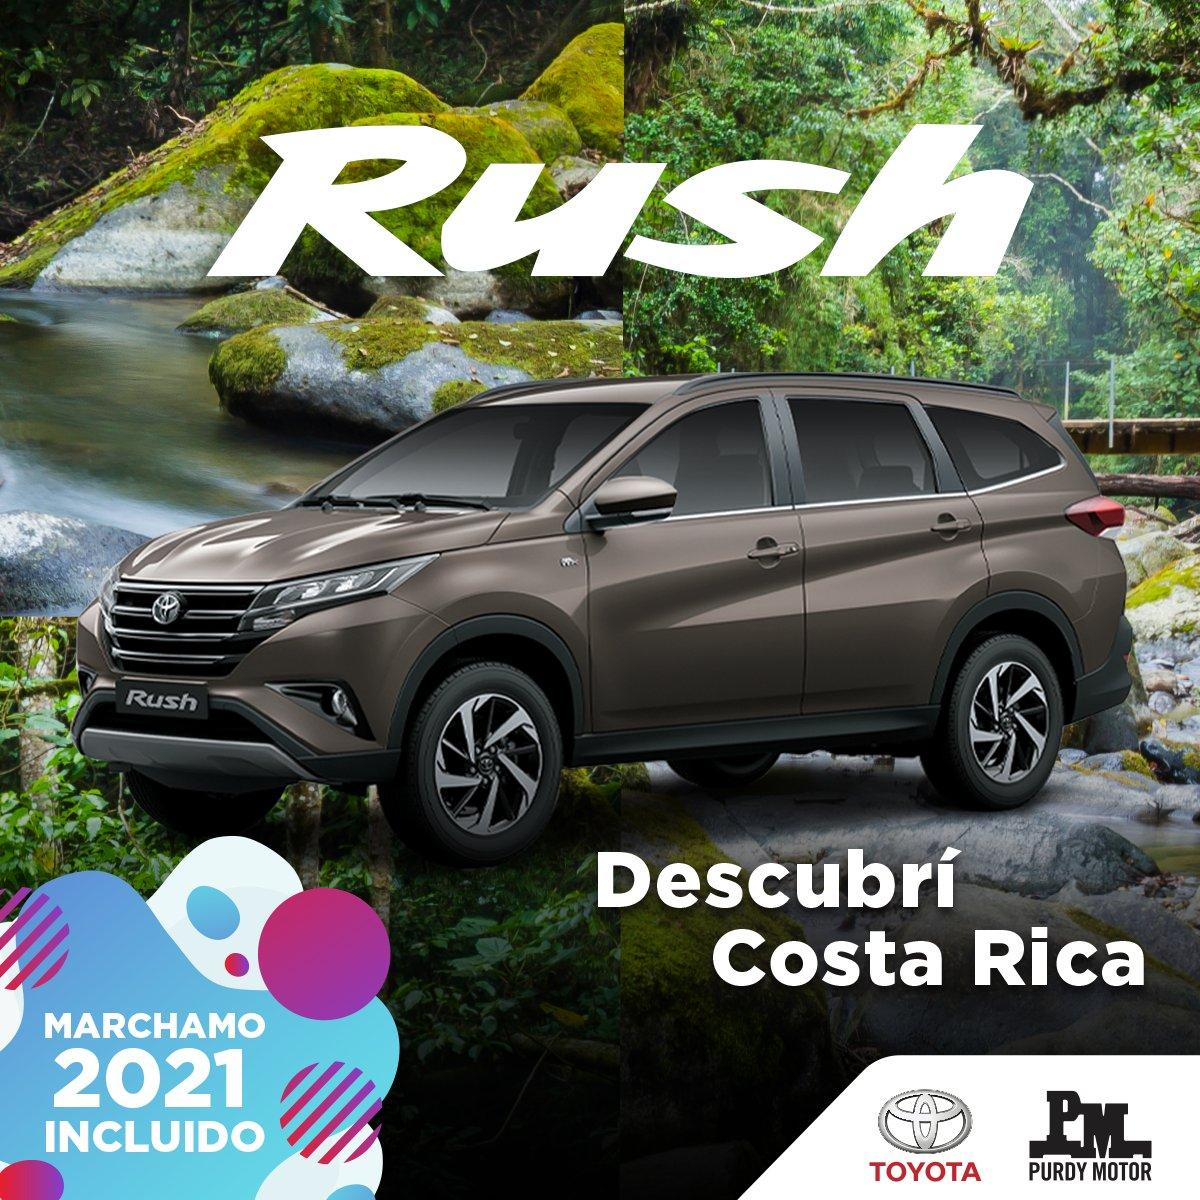 Llevate tu Toyota Rush con marchamo incluido y descubrí Costa Rica Toyoteando en burbuja.  Contactá un asesor por medio de nuestro Whatsapp: 8589-1000 o https://t.co/wEoya9MYKc  #toyota #rush https://t.co/xHbRVmj2q1